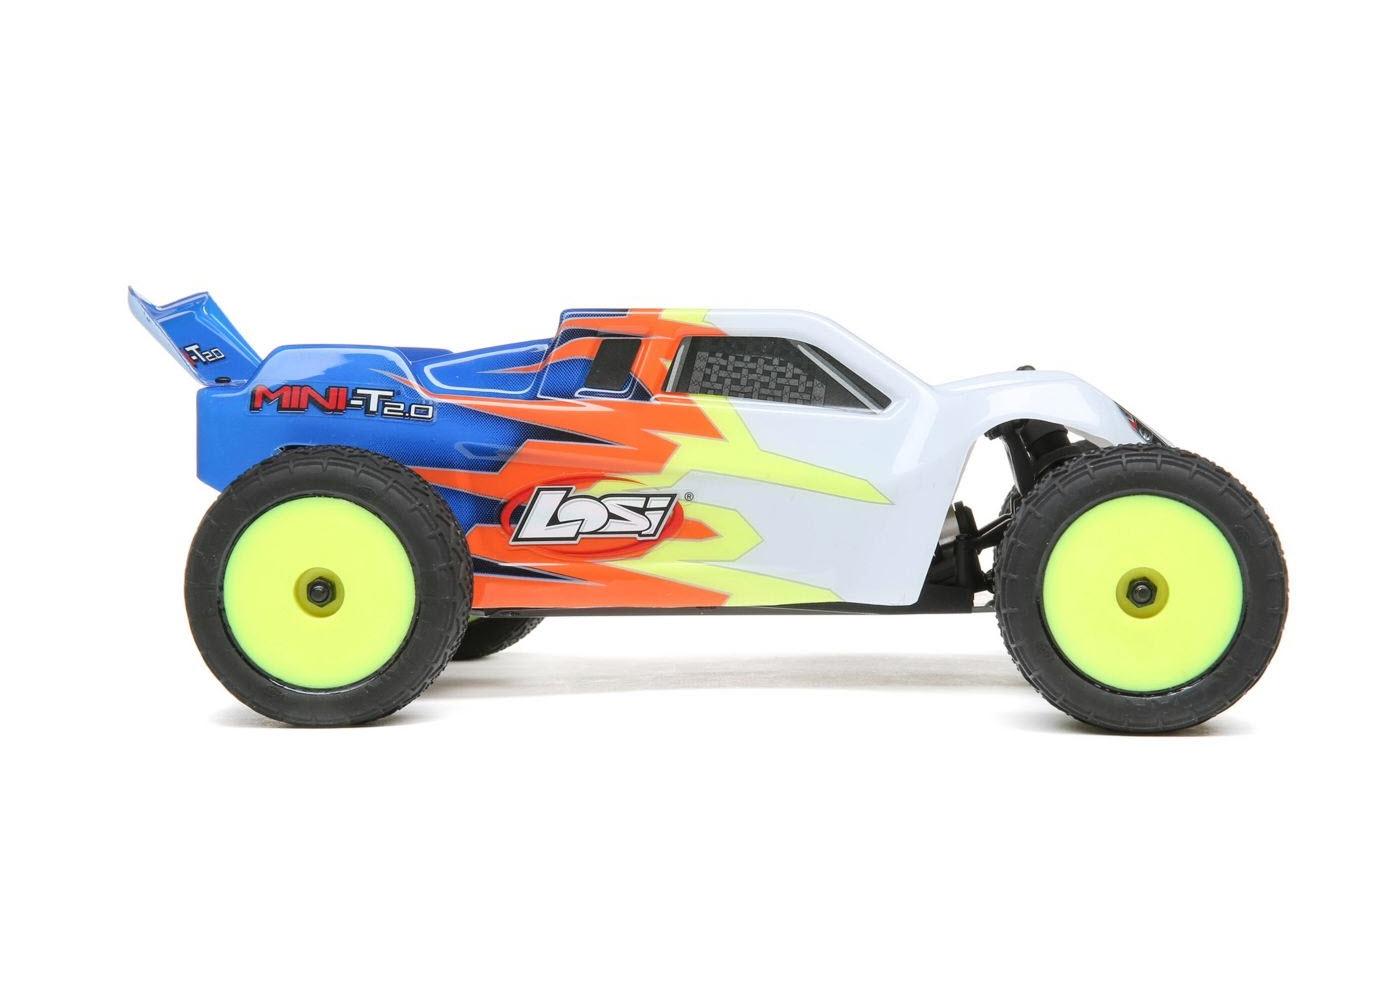 Losi Mini-T 2.0 RTR  Blue and White 1//18 Scale 2wd Stadium Truck